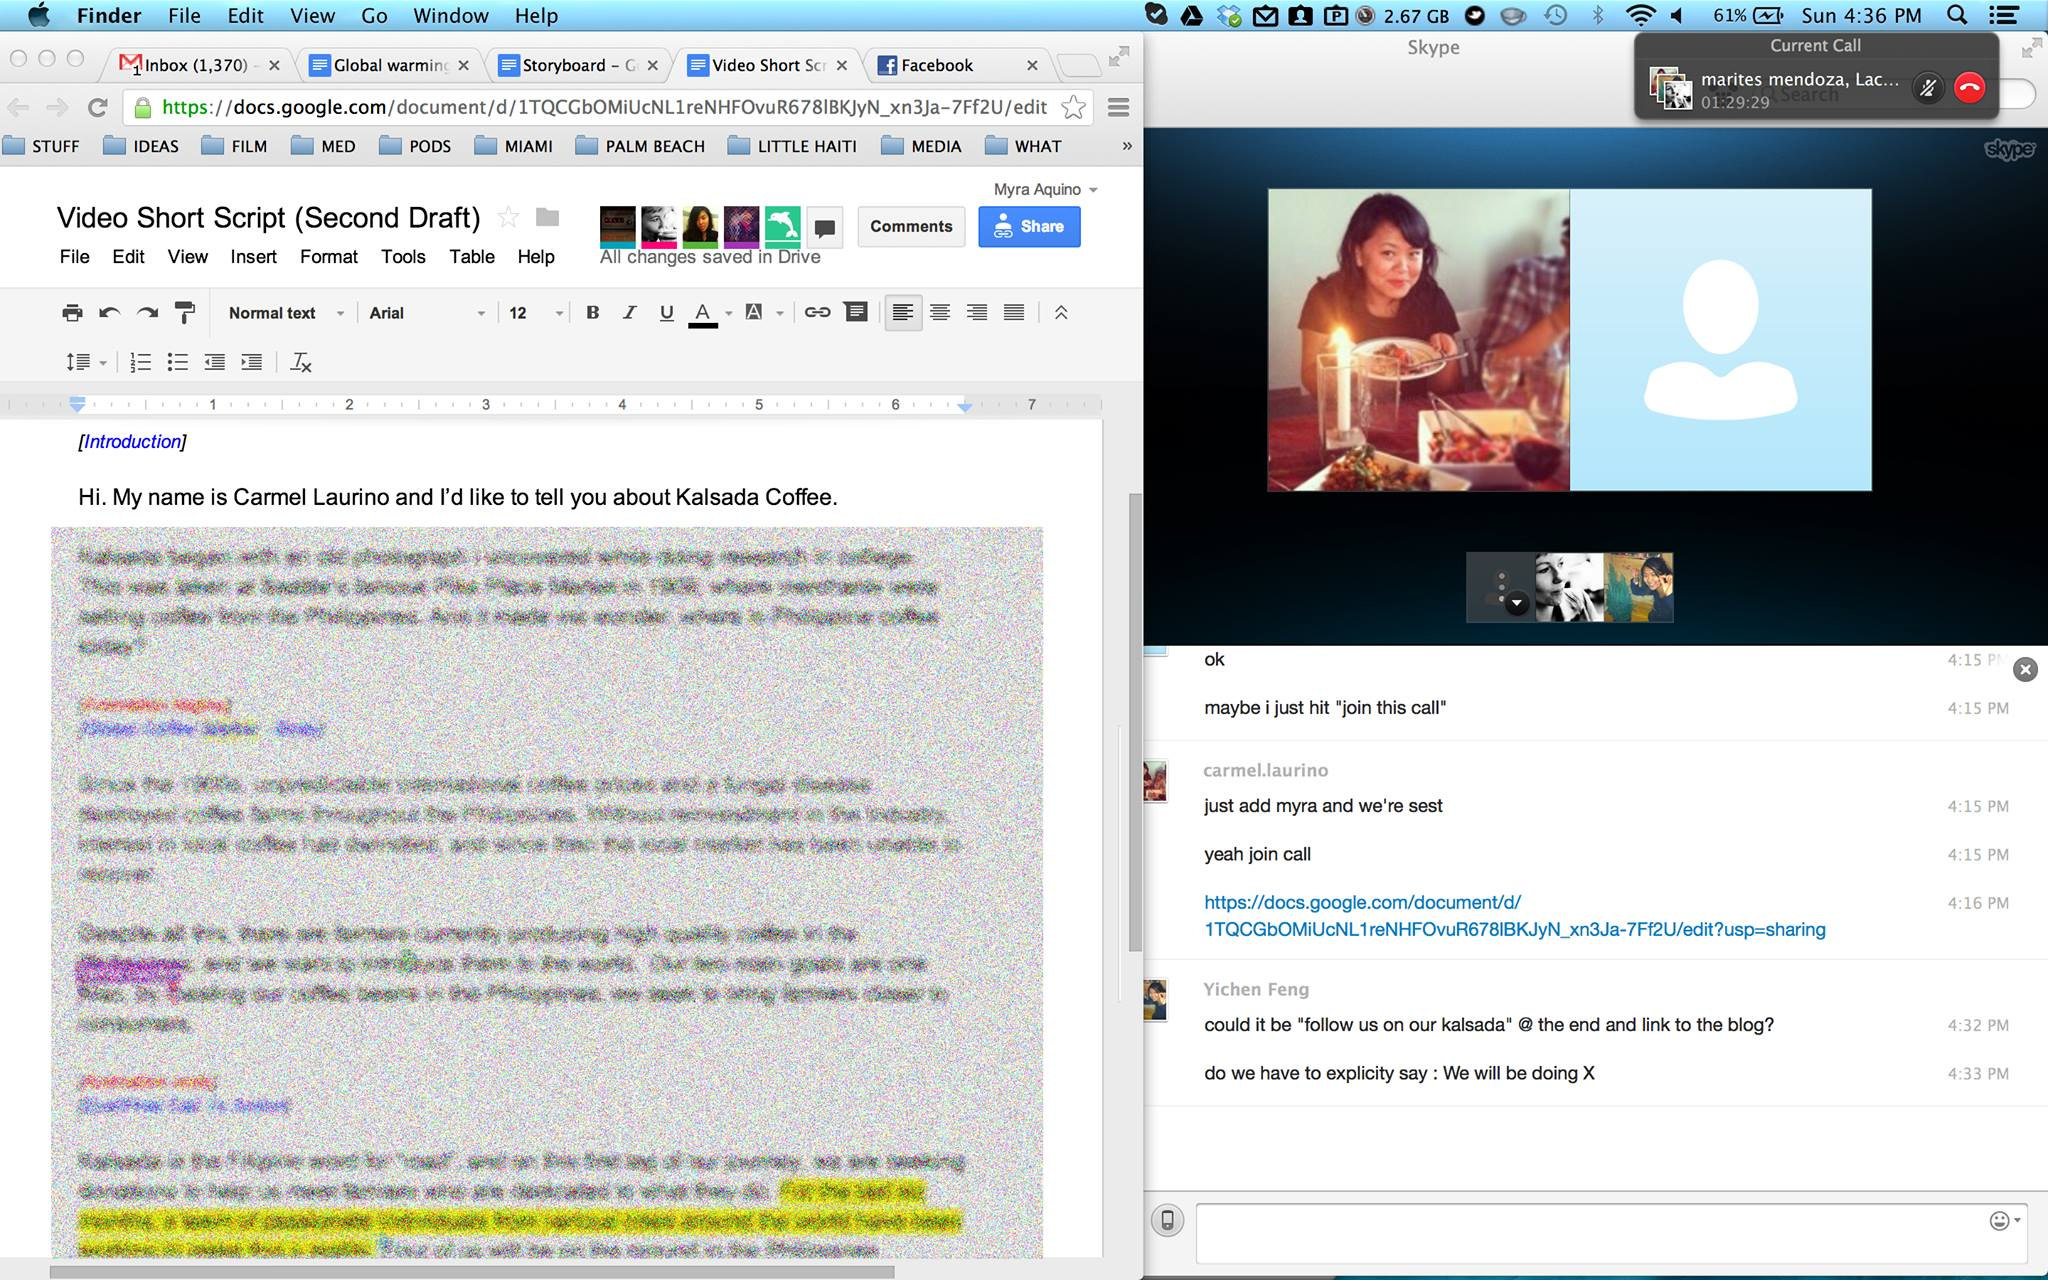 One of many Skype / Google Doc work dates connecting Seattle, Miami, LA, Manila, Paris.